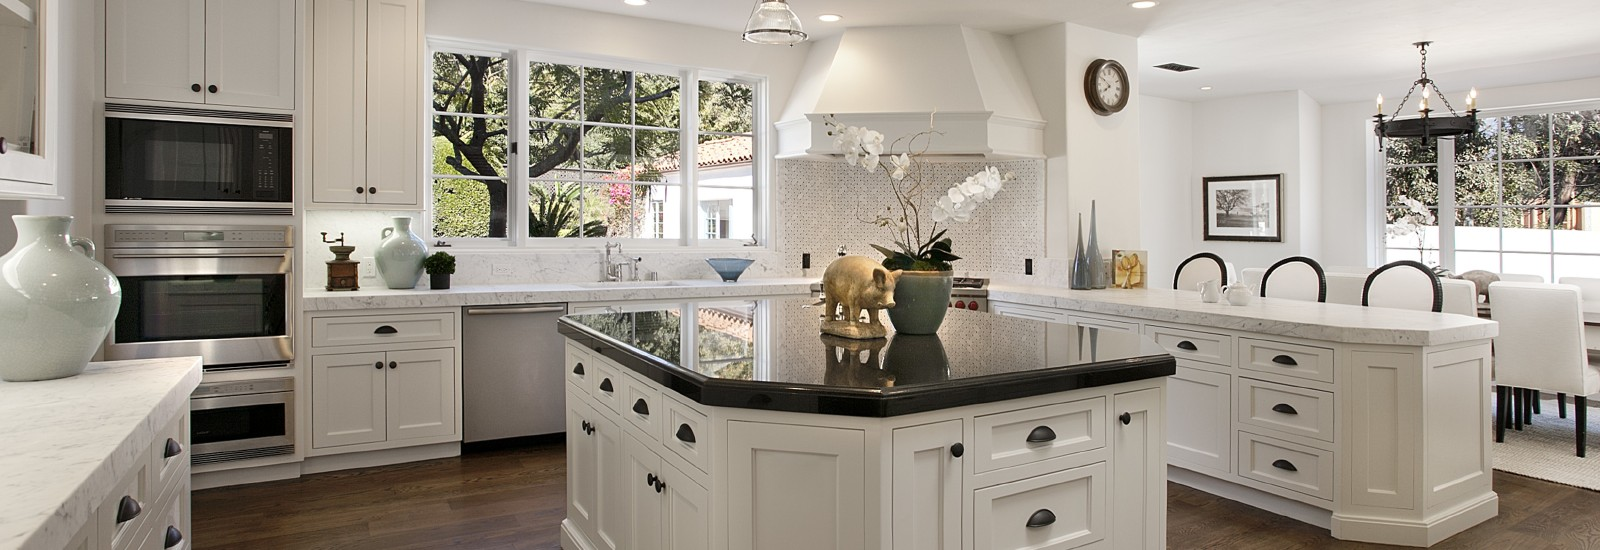 1600x550_kitchen-interior-belaya-kuhnya-dizajn-stulya-lampyi.jpg